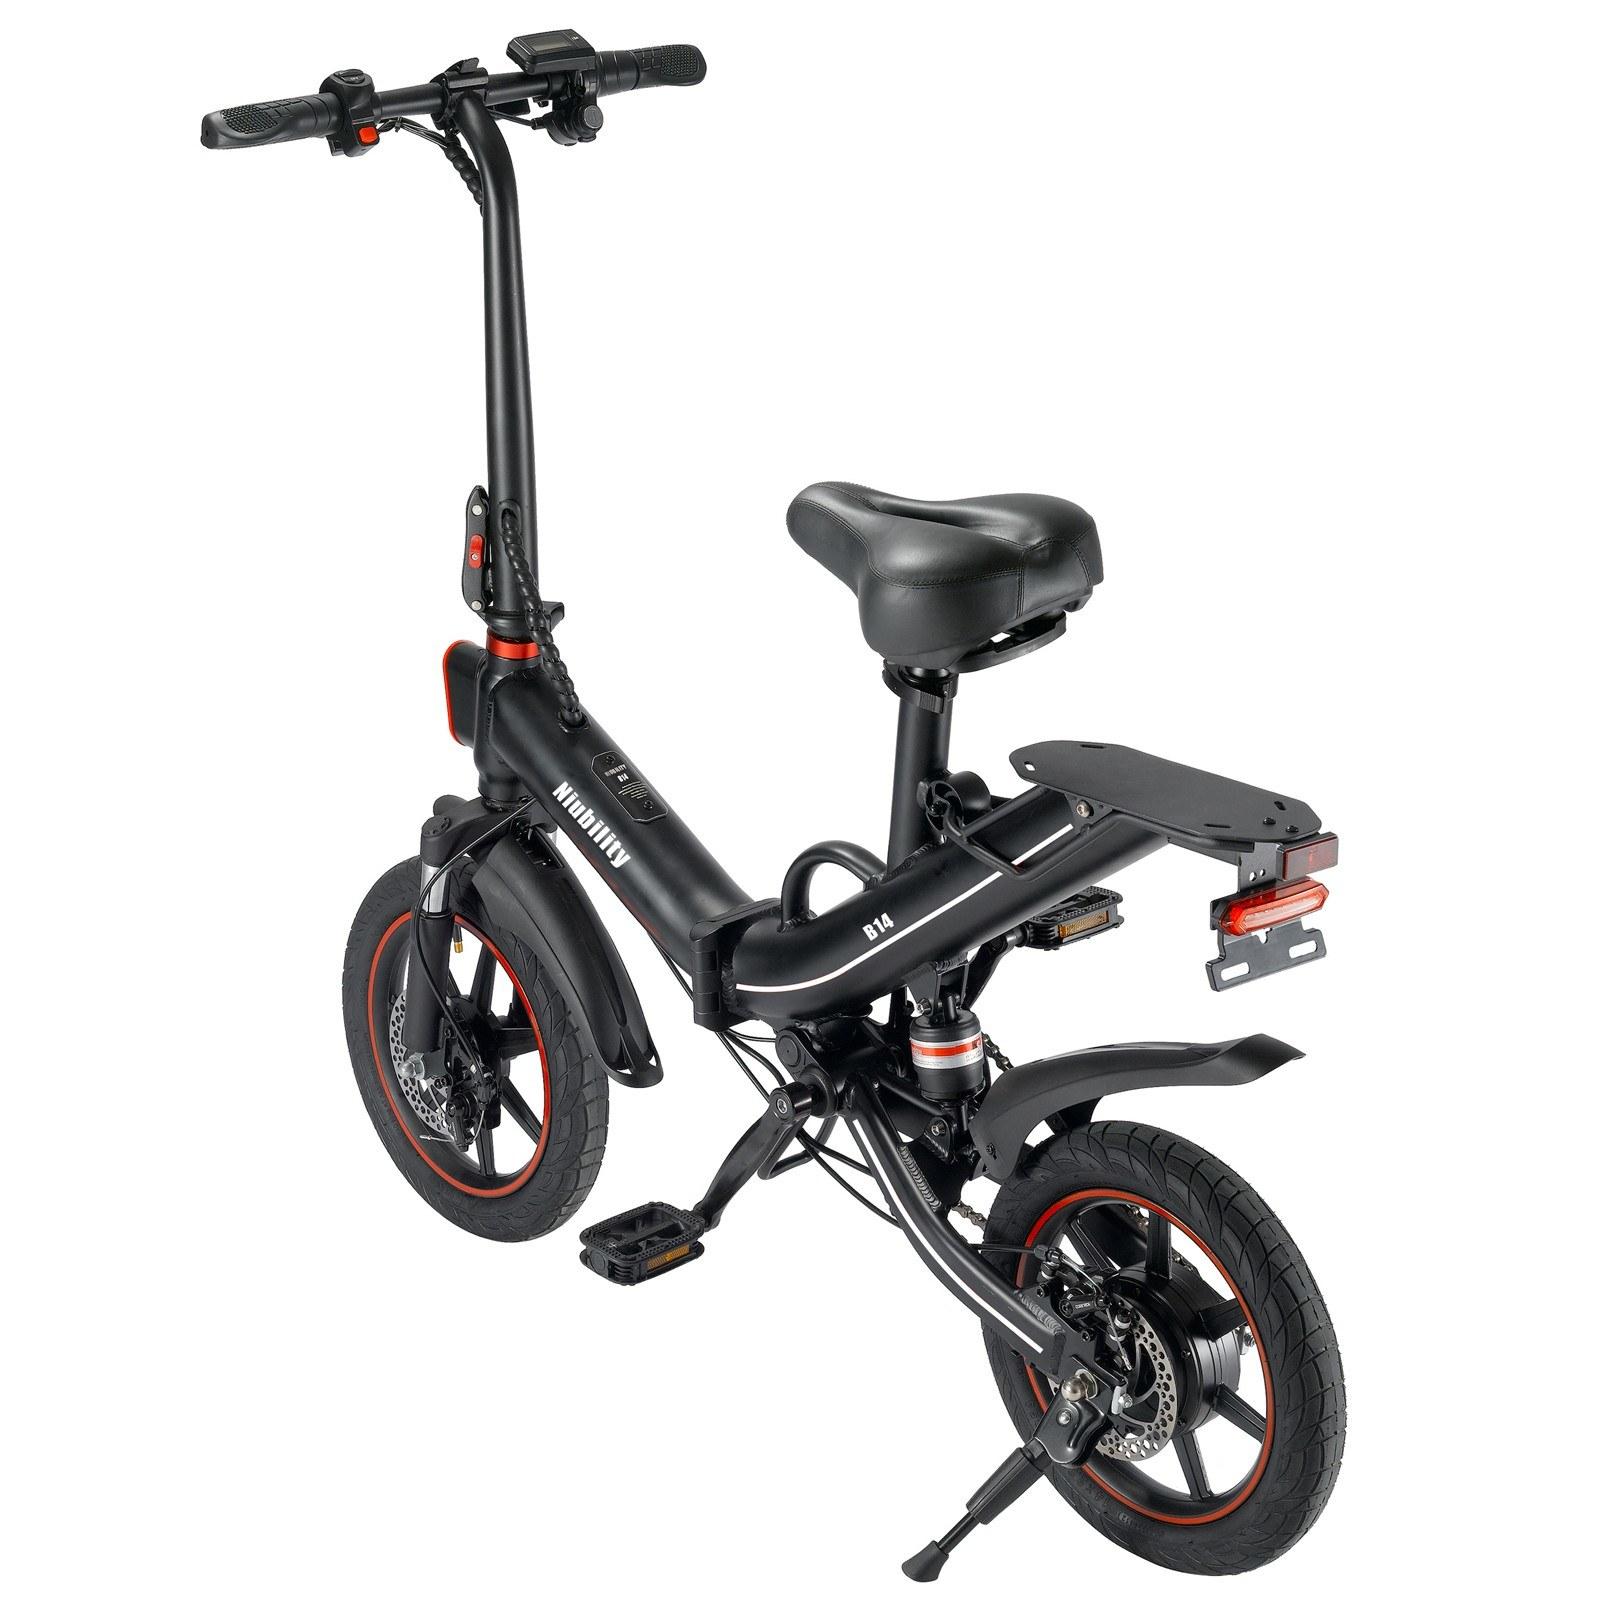 tomtop.com - [EU Warehouse] $436 OFF  Niubility B14 14 Inch Folding Electric Bike, $663.99 (Inclusiev of VAT)